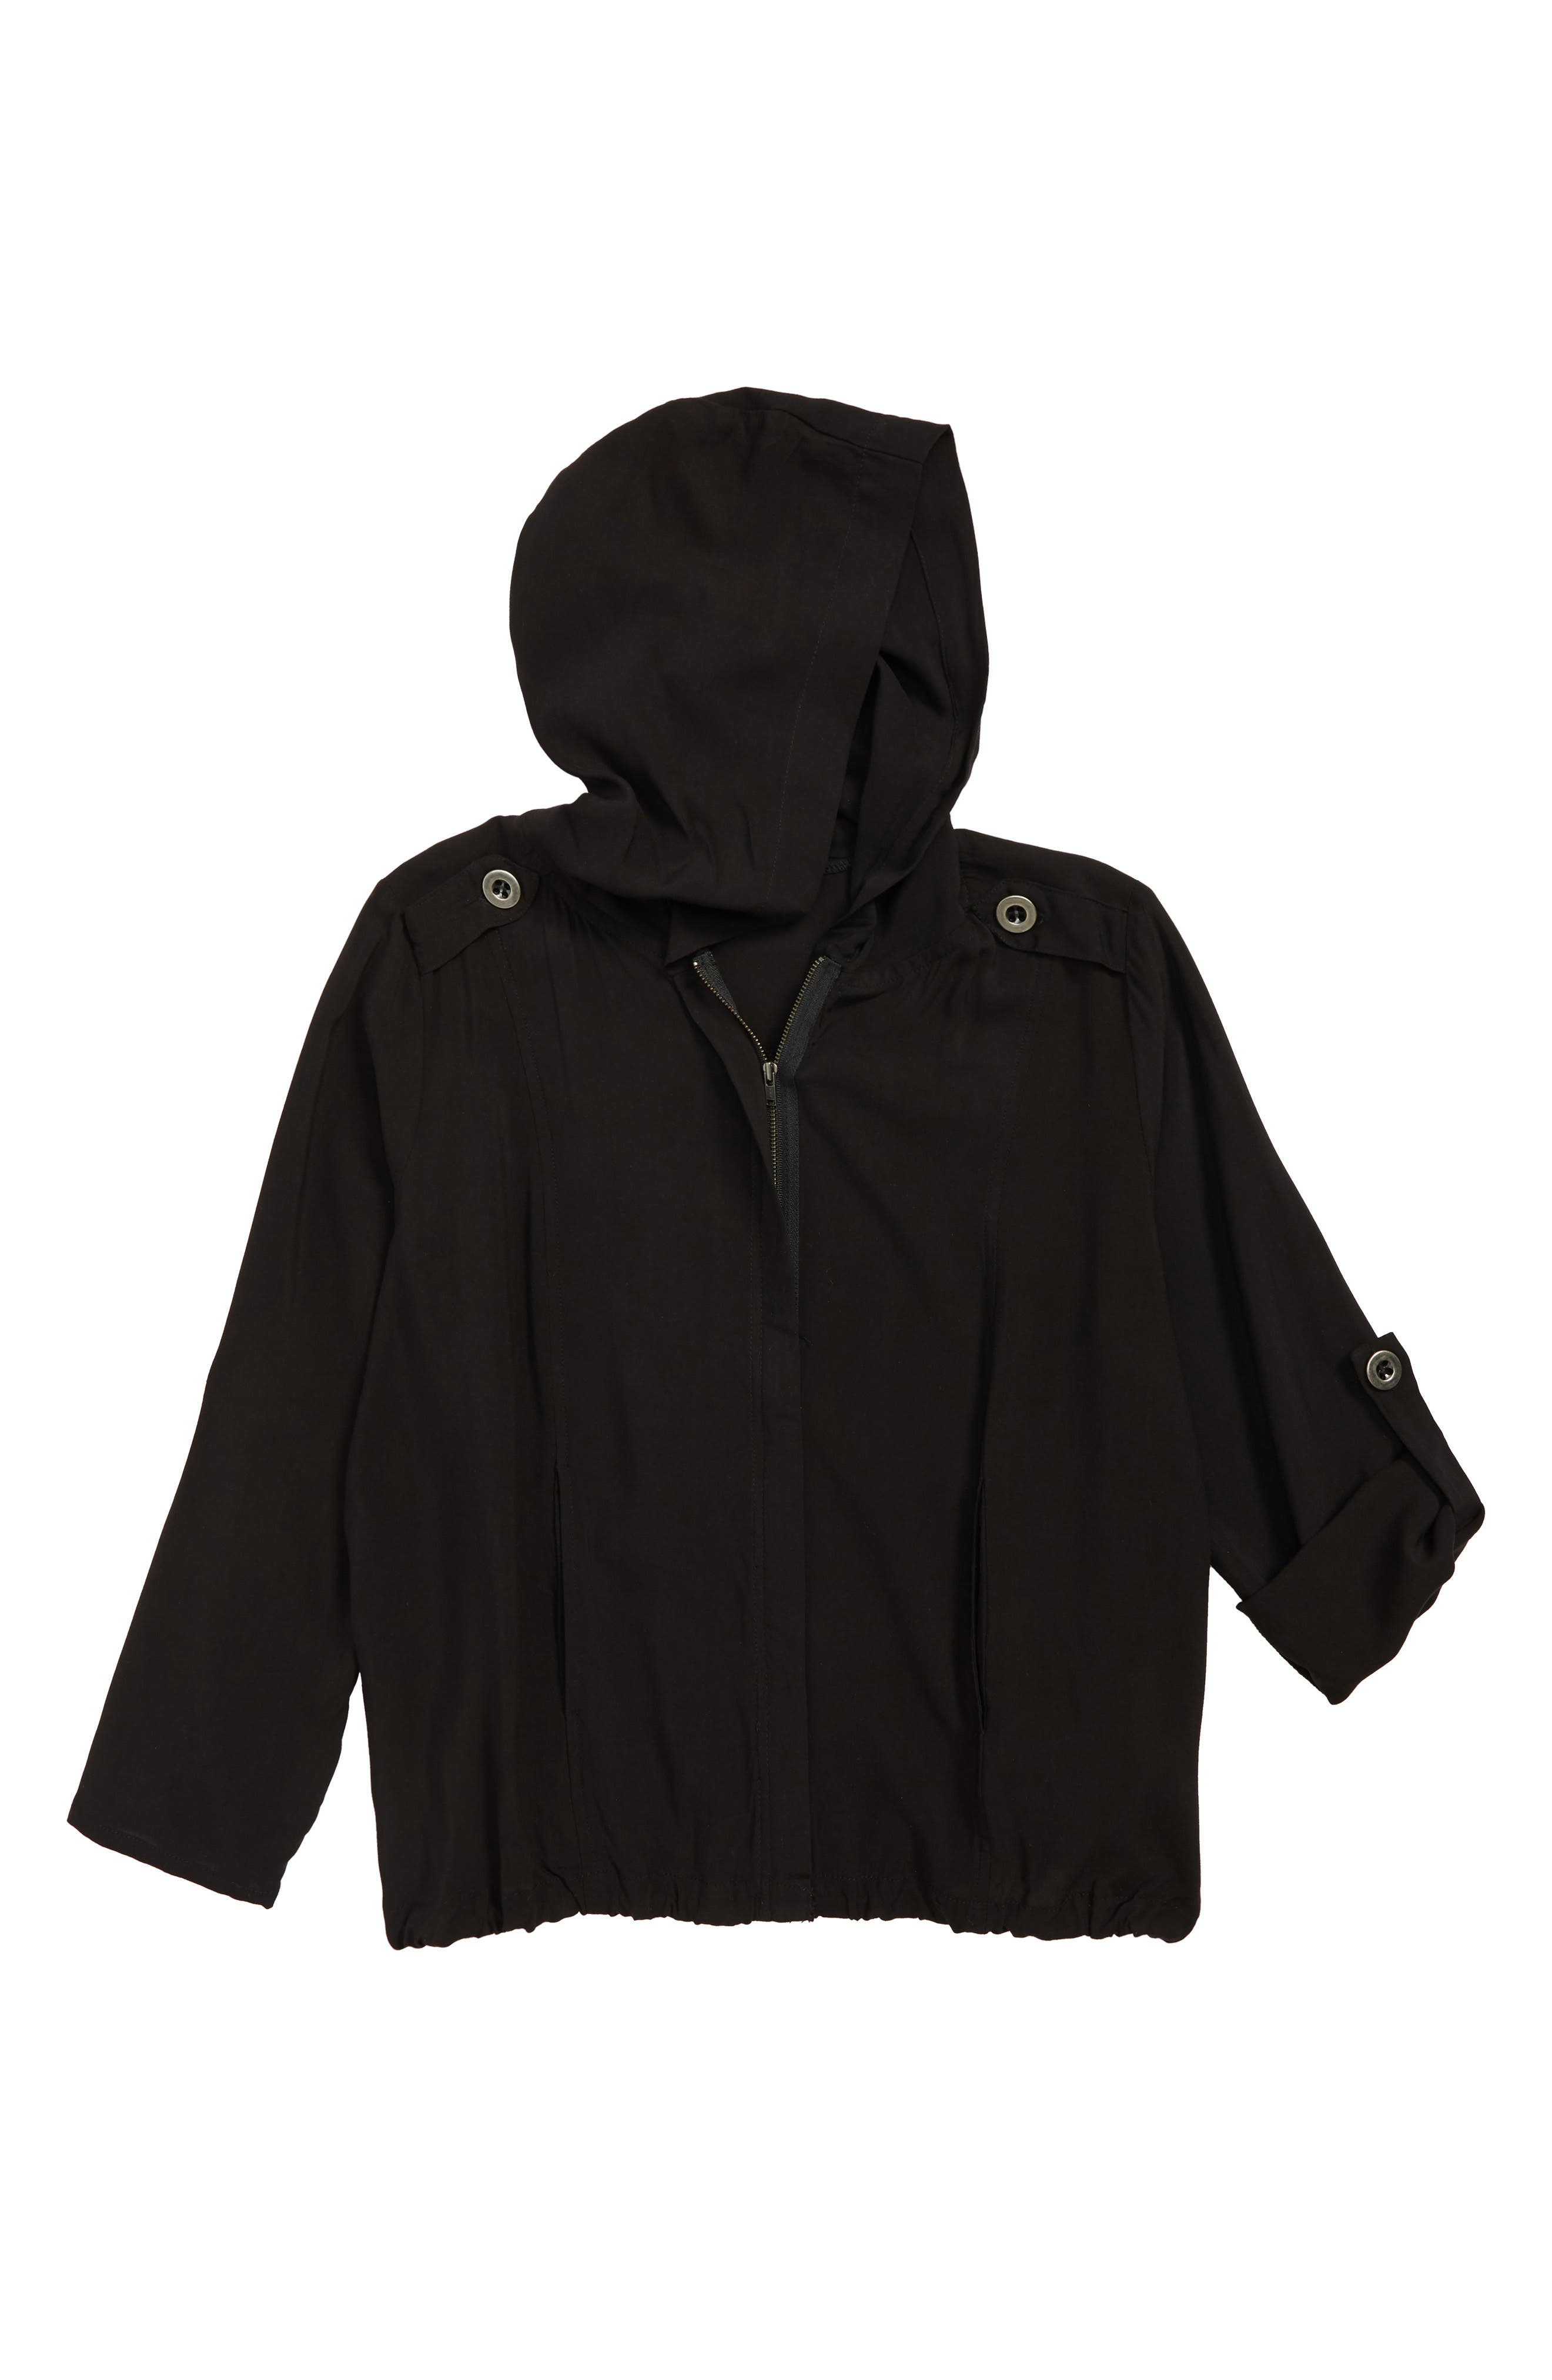 WALKING ON SUNSHINE Hooded Jacket, Main, color, BLACK